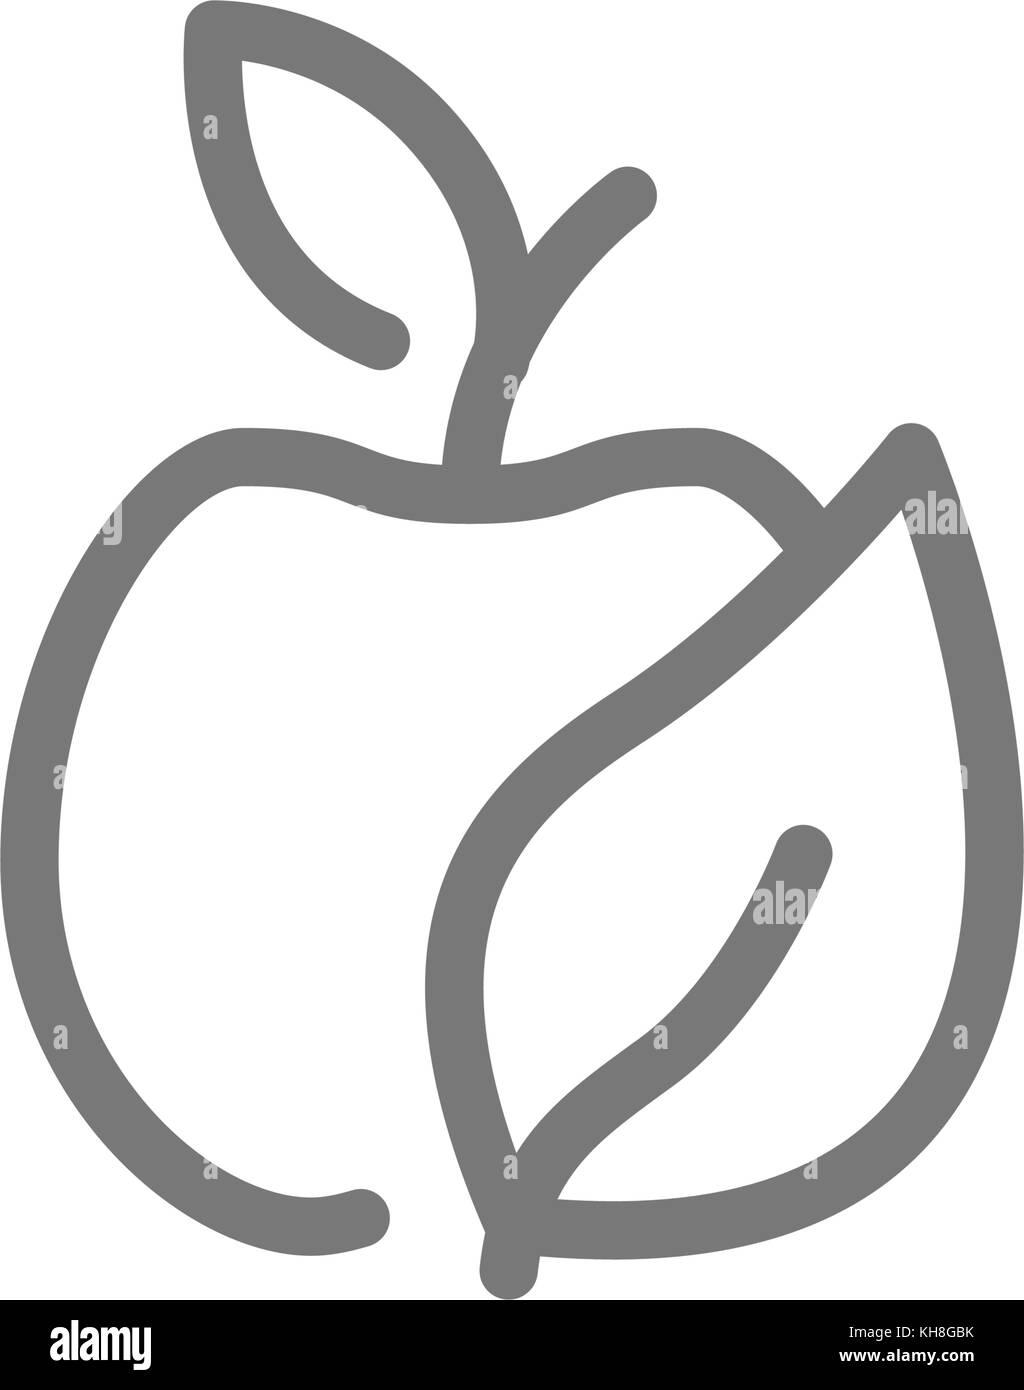 Apple symbol stock photos apple symbol stock images alamy simple eco apple line icon symbol and sign vector illustration design isolated on white buycottarizona